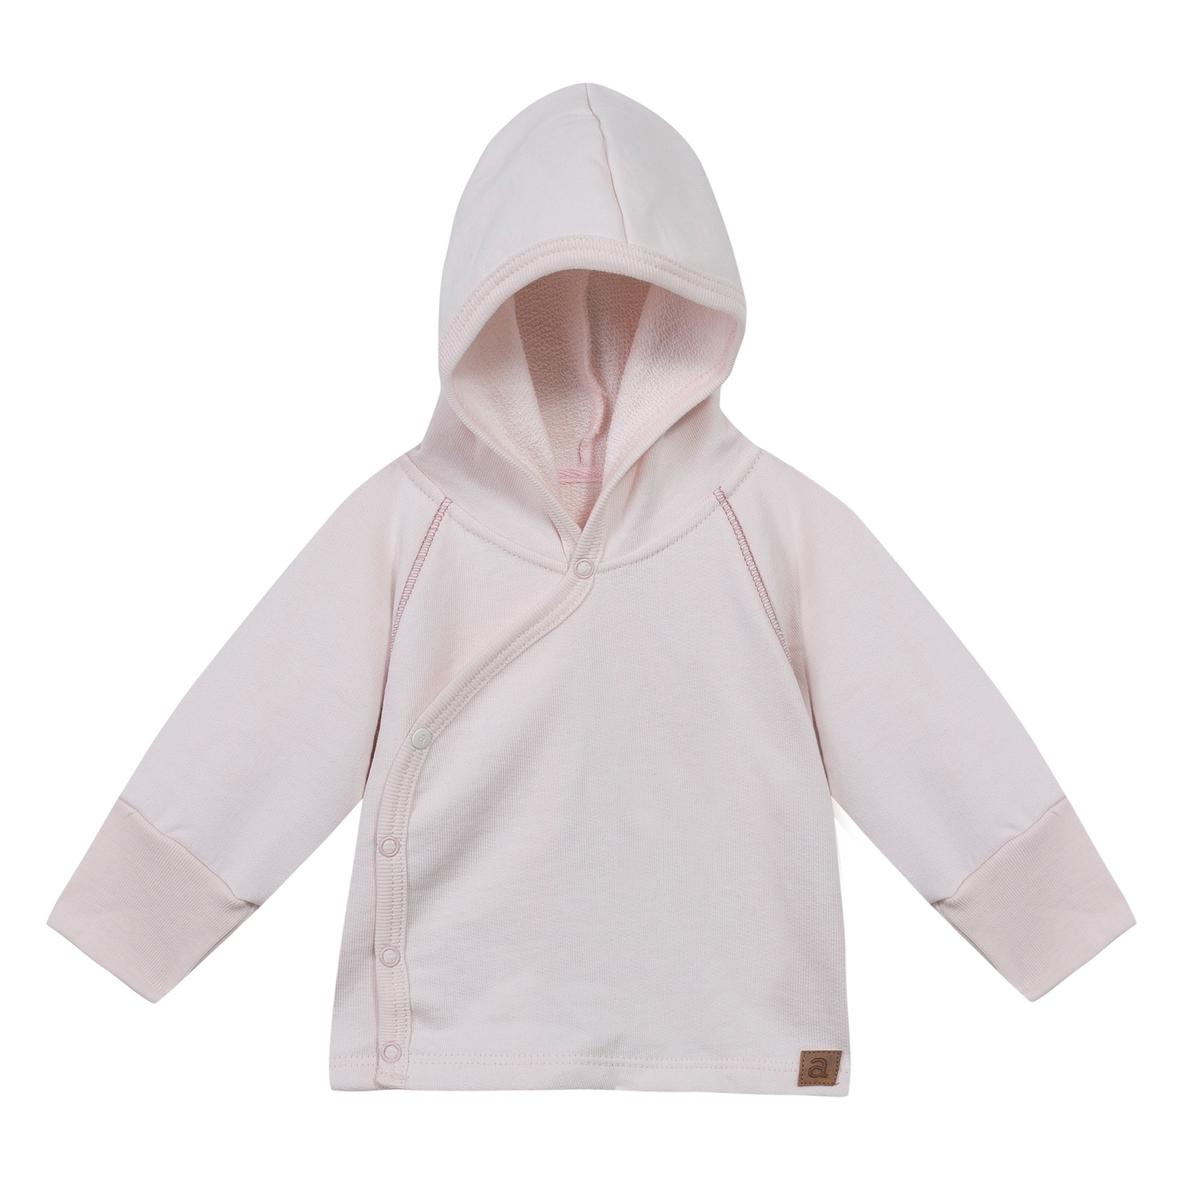 Пальто с капюшоном 0 мес. - 9 мес. осень зимняя рубашка мужская мода minato one piece anime luffy с капюшоном с капюшоном с капюшоном толстый толстовки сша размер